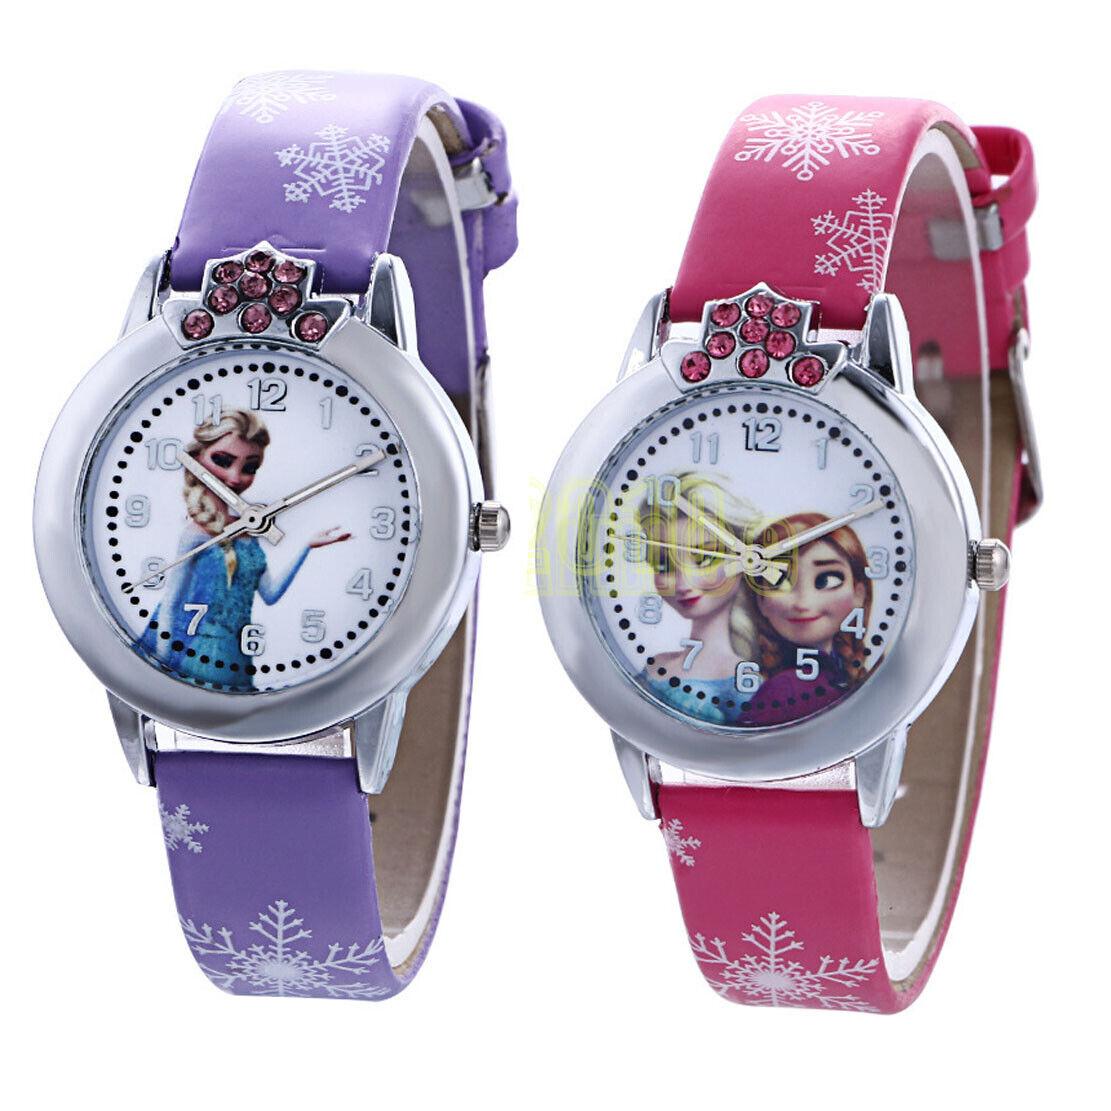 Disney Frozen Elsa Anna Quartz Wrist Watch Perfect Gift for